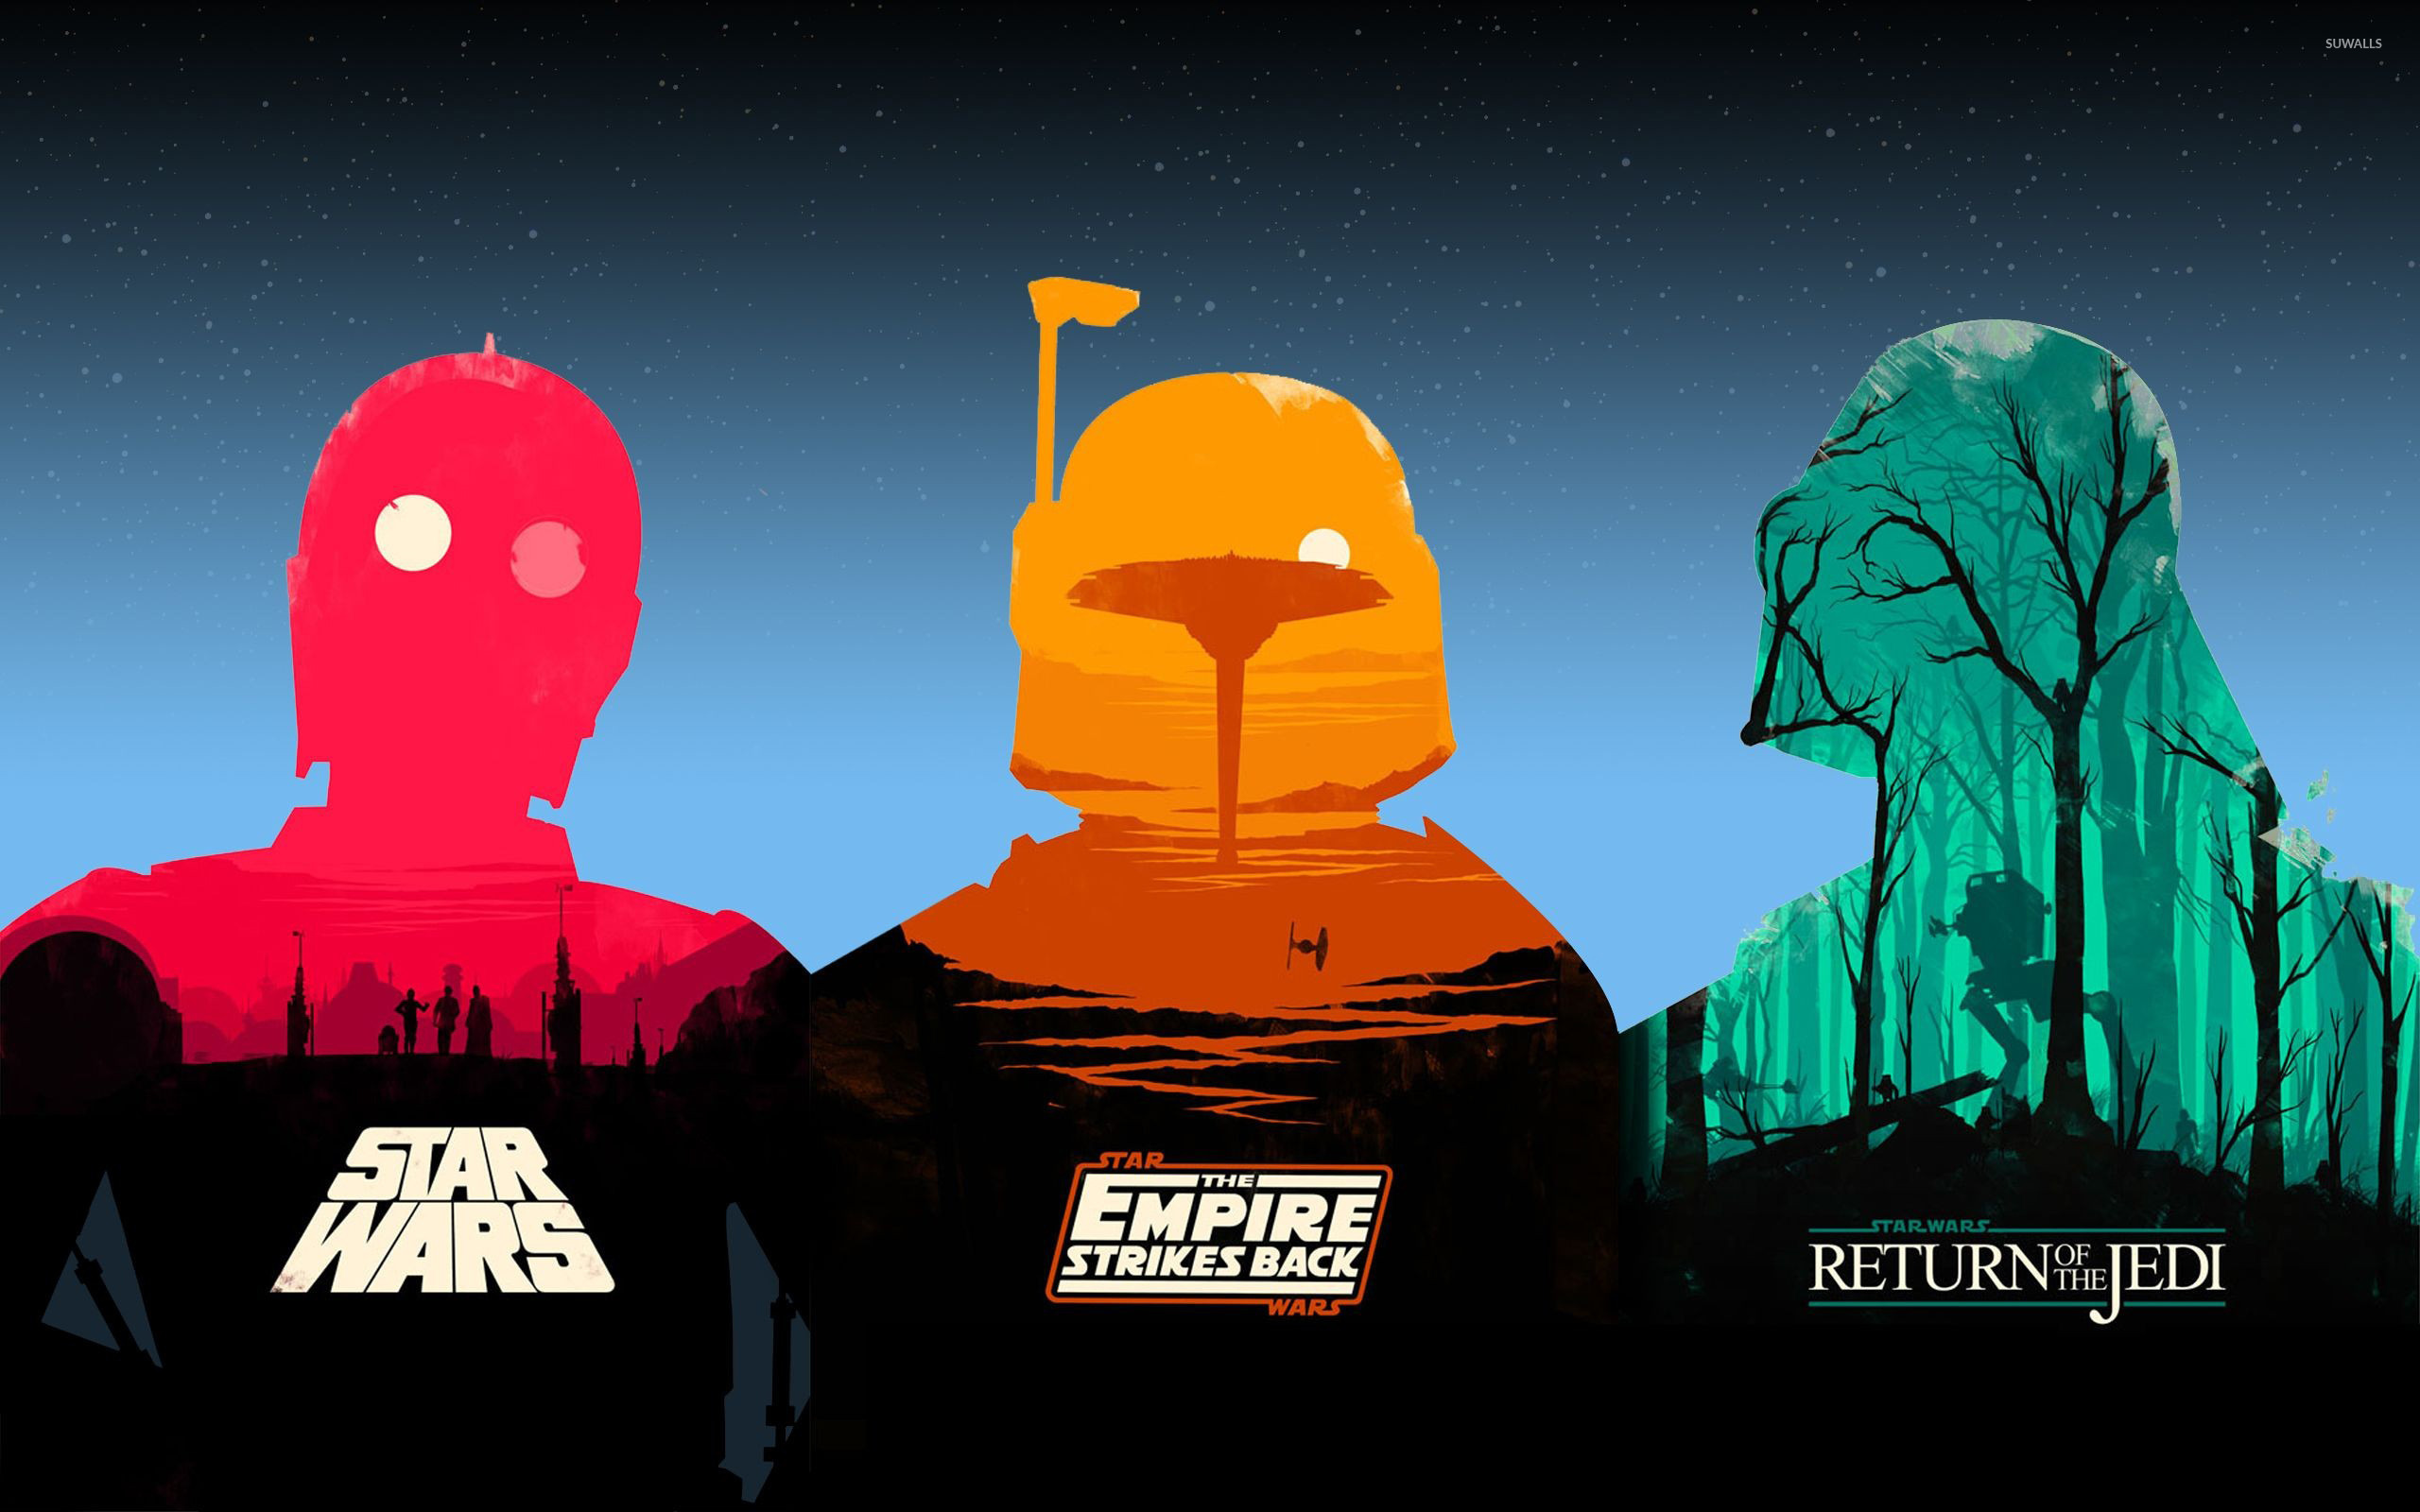 Star Wars poster wallpaper   Movie wallpapers   15176 2560x1600